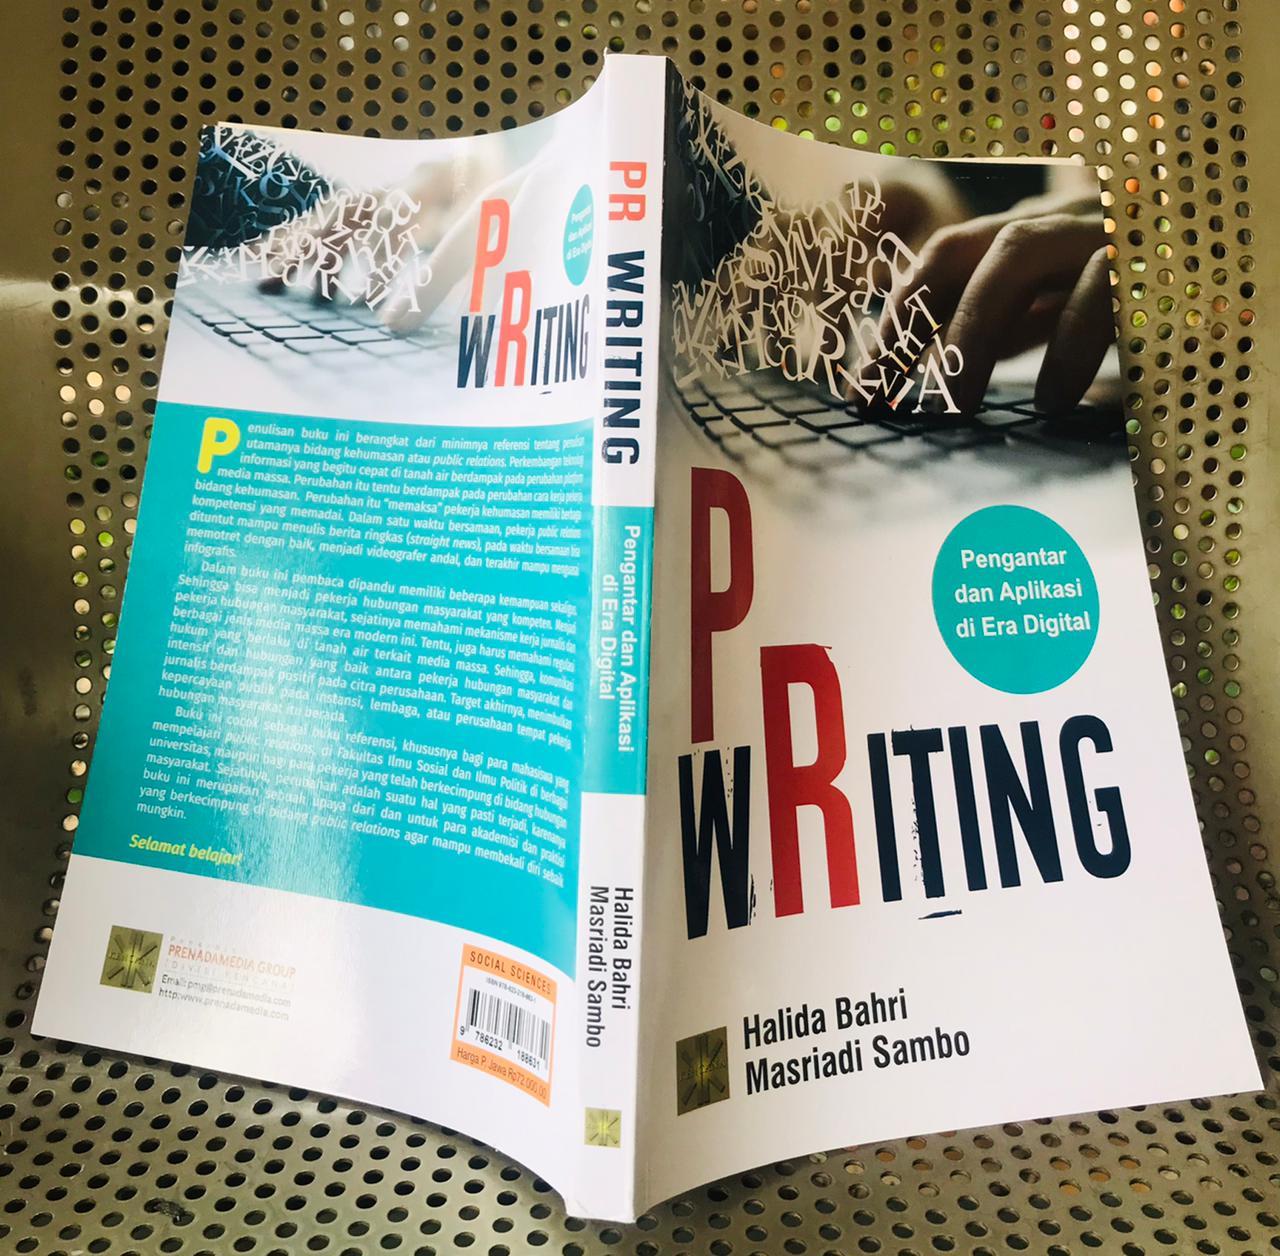 Alumni Unimal Aceh Utara Terbitkan Buku PR Writing thumbnail